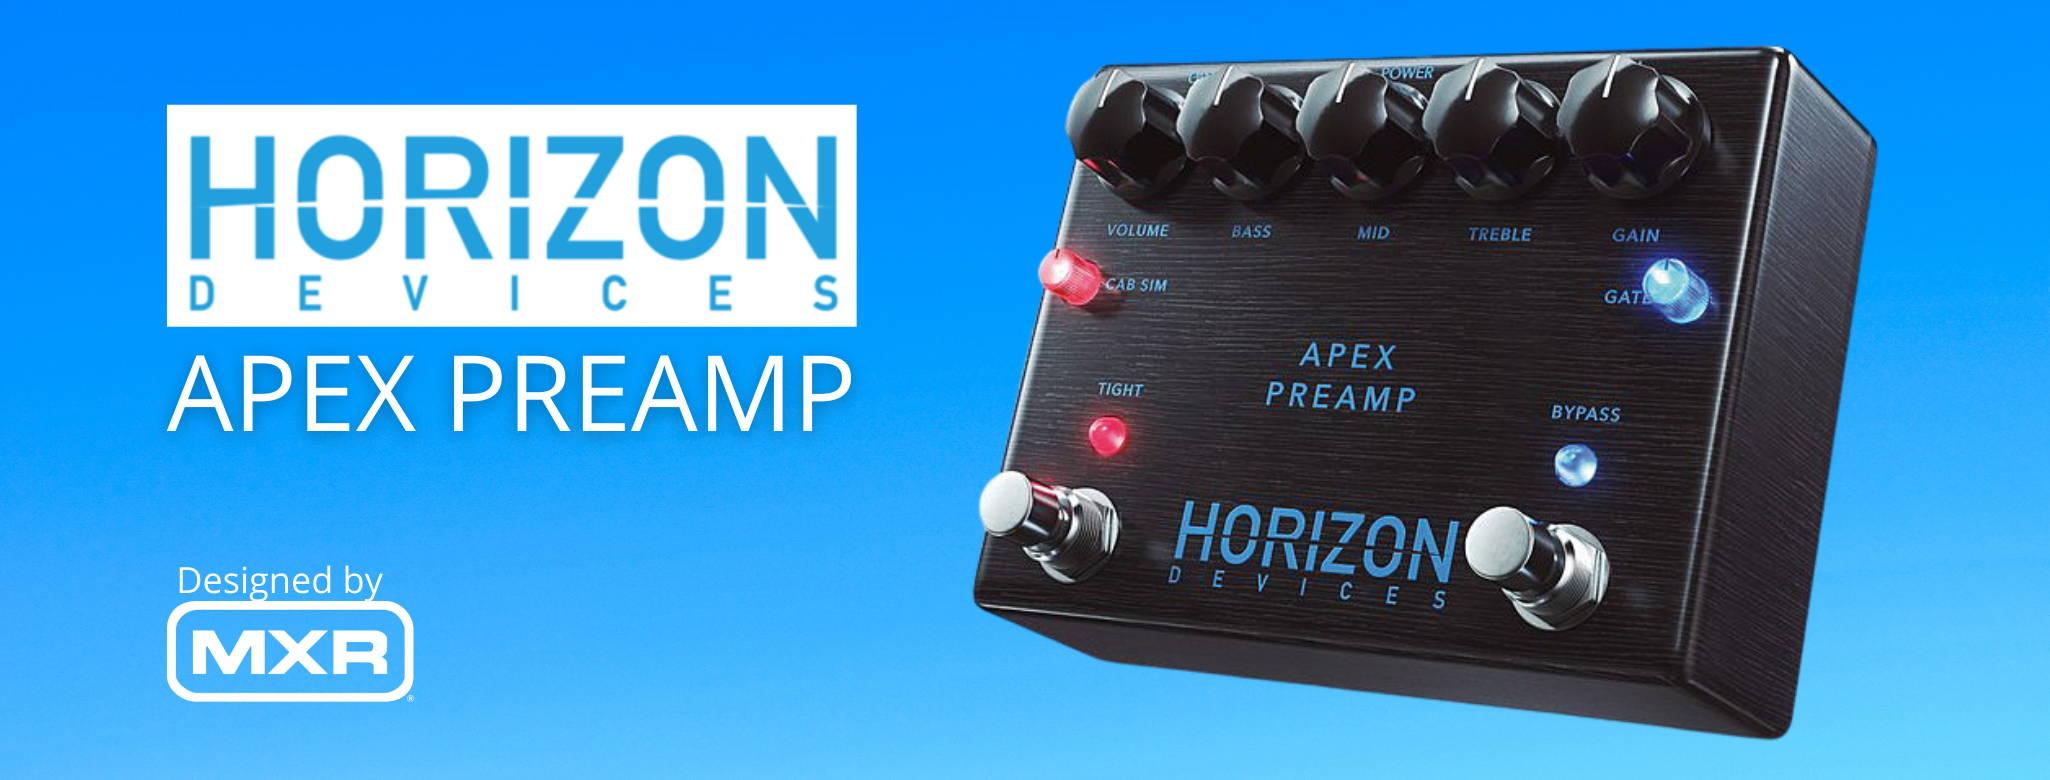 Horizon Devices Apex Preamp [MUSIC440]